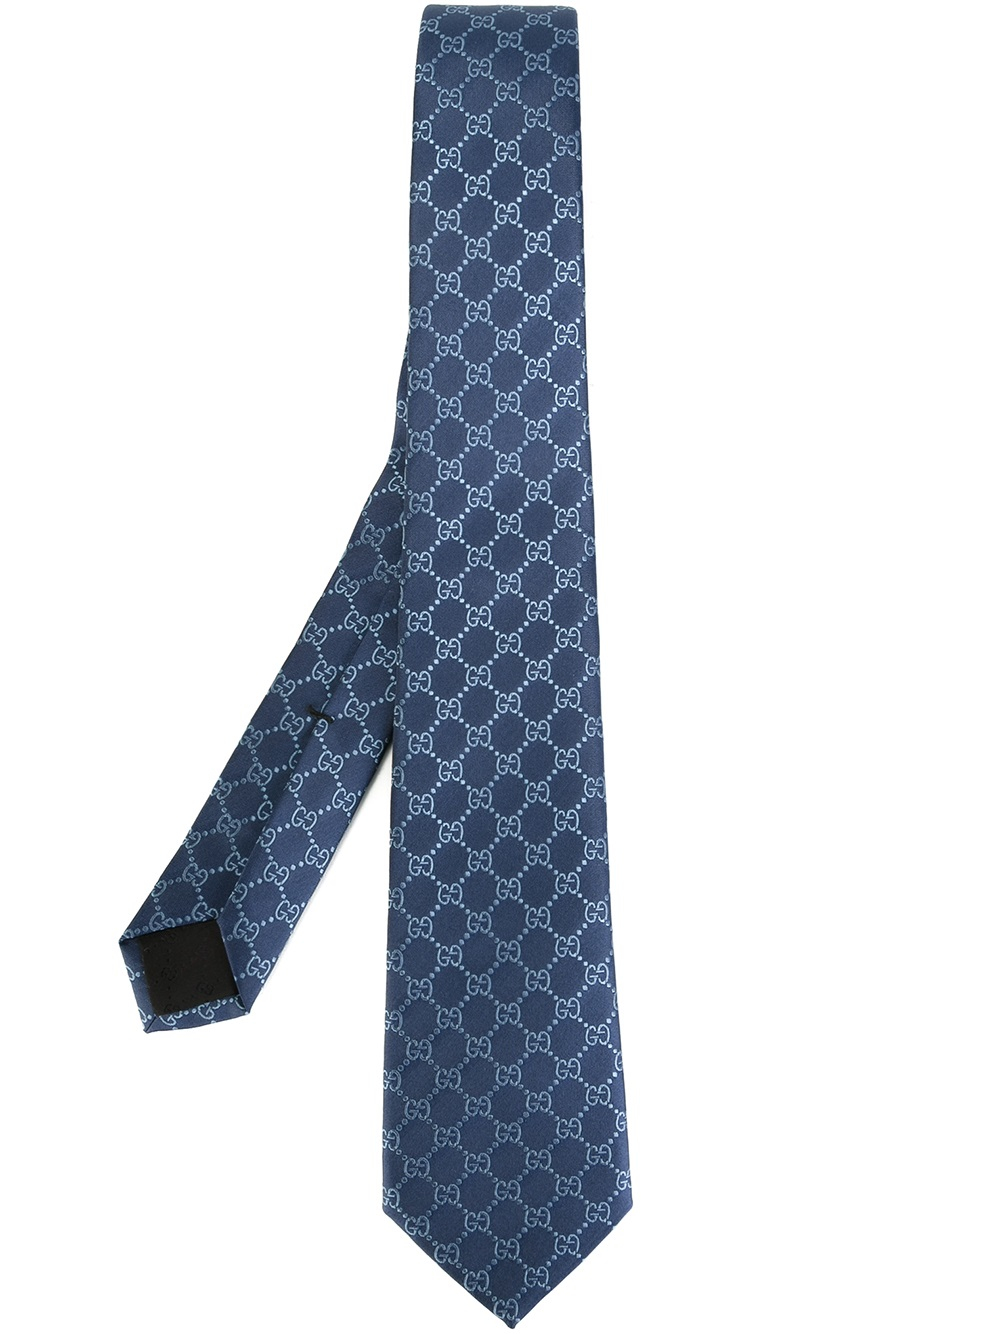 68cd03c3acc3 Gucci Gg Pattern Silk Jacquard Tie in Blue for Men - Lyst